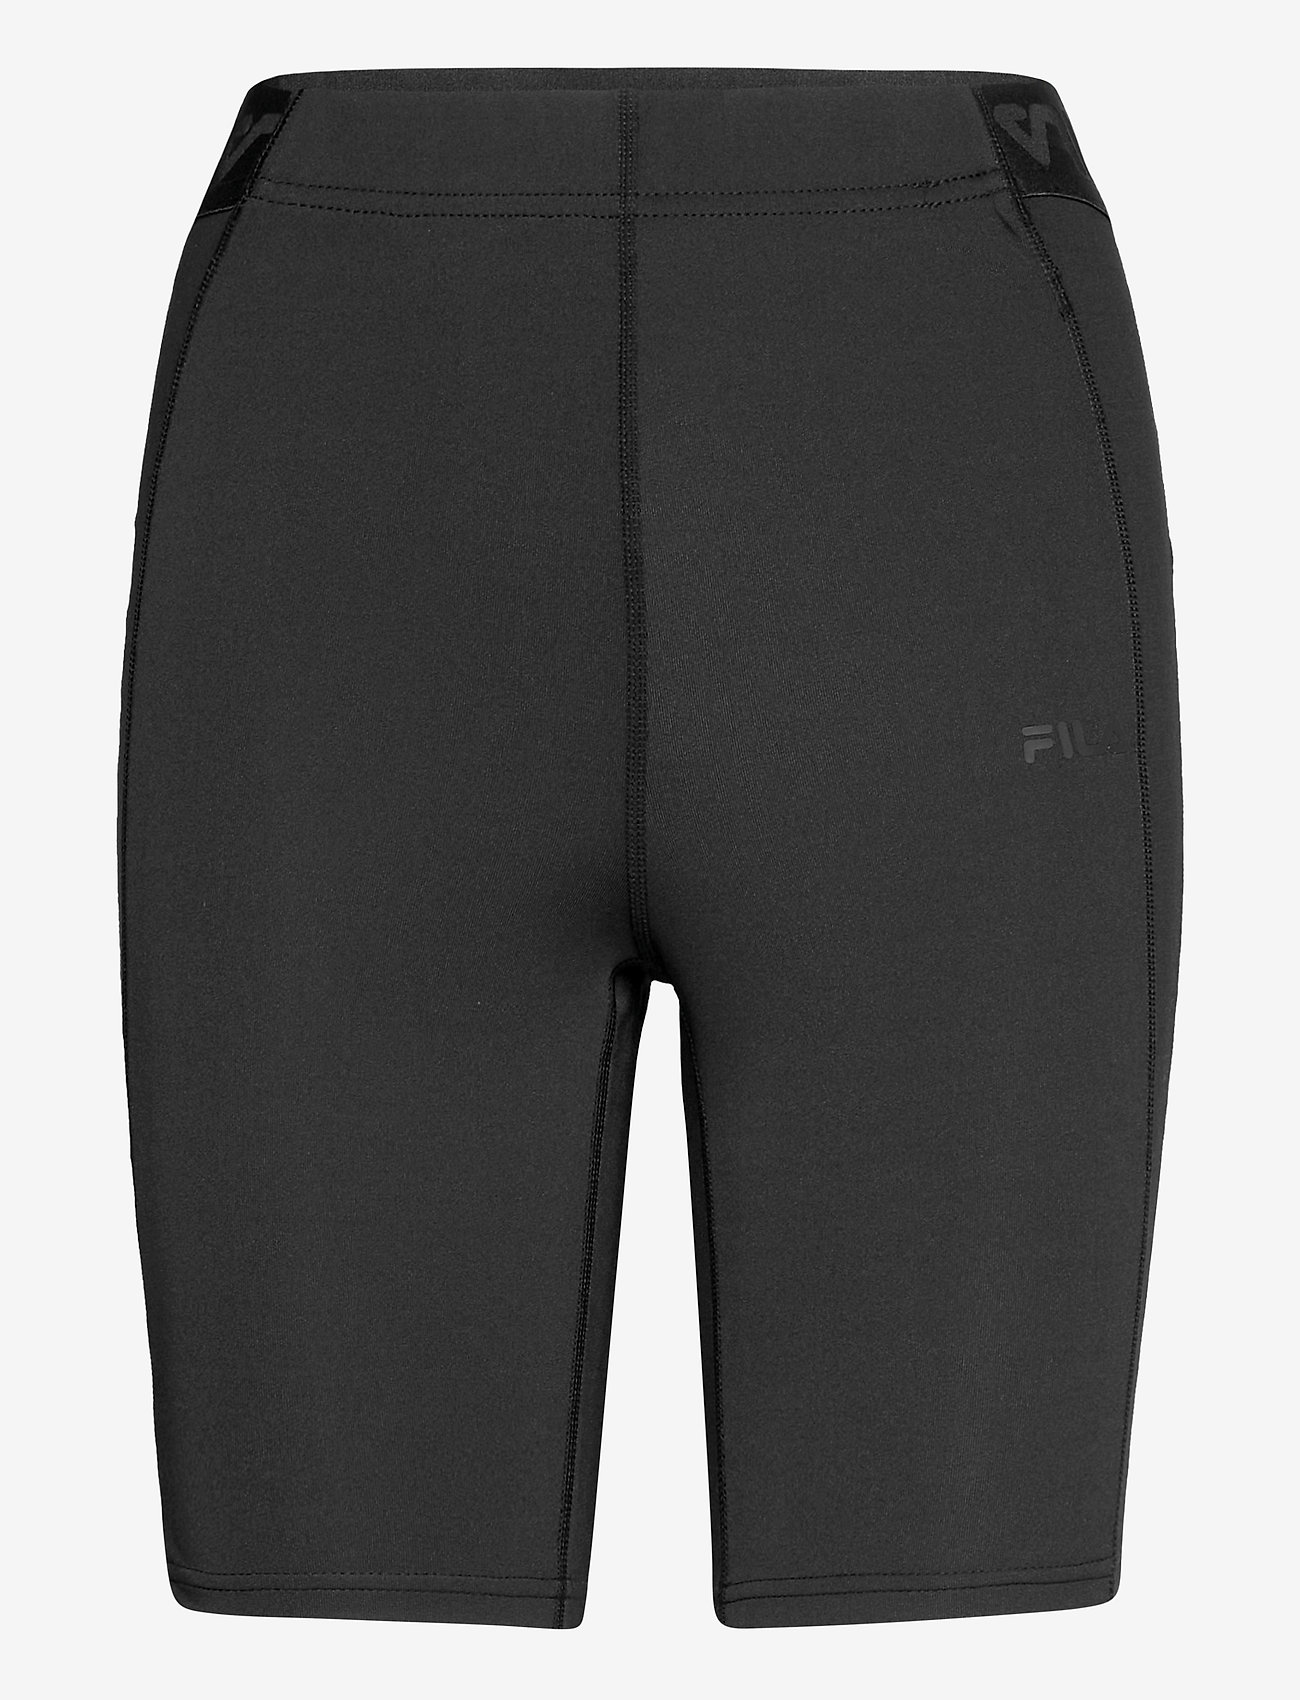 FILA - WOMEN CANIKA short leggings - chaussures de course - black - 0